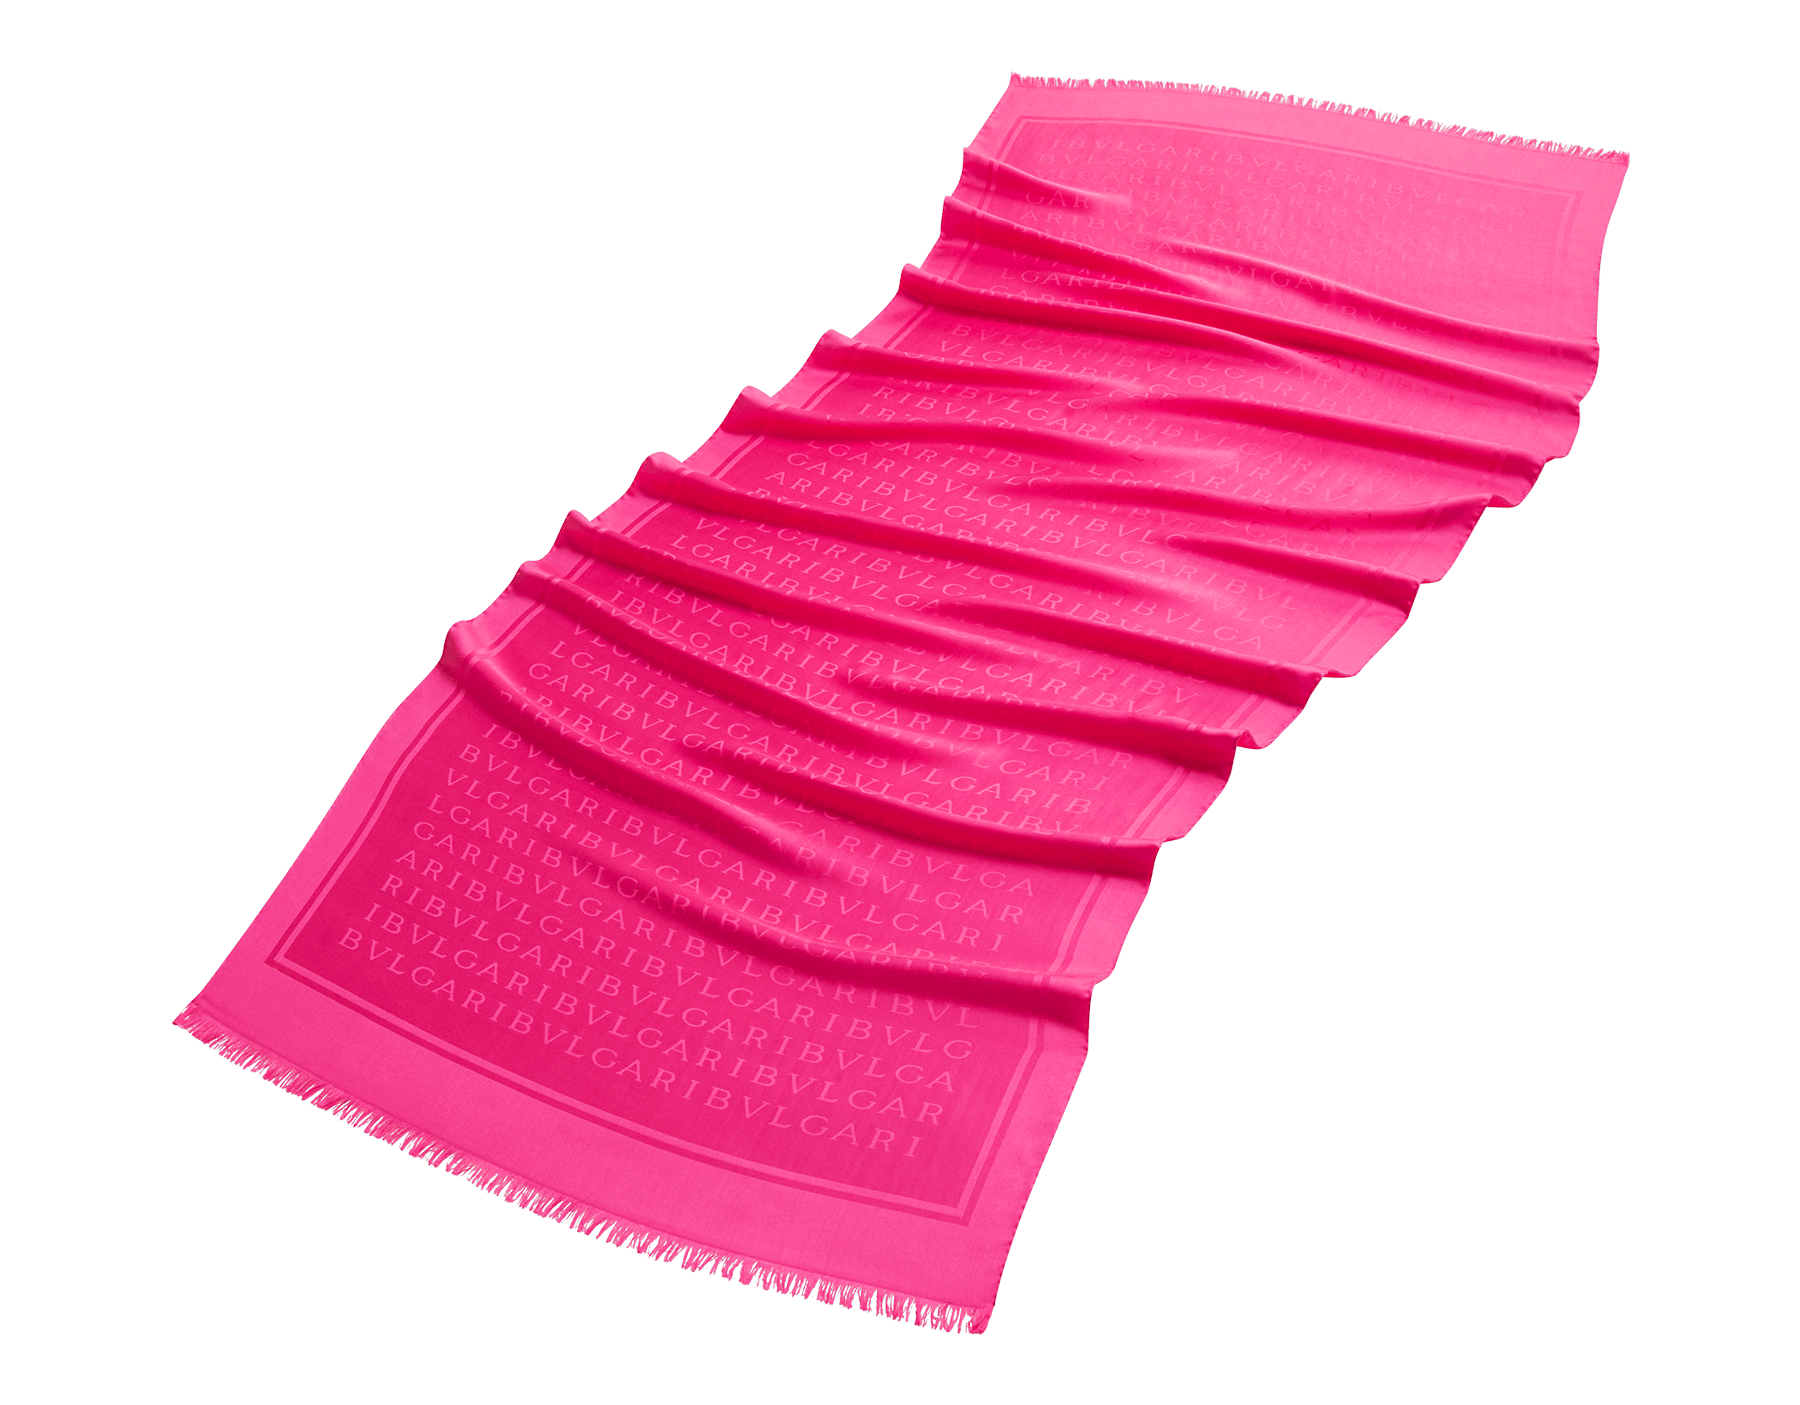 """Lettere Maxi Light"" Stola in pinkem Flash Amethyst aus feiner Seide. 244052 image 1"